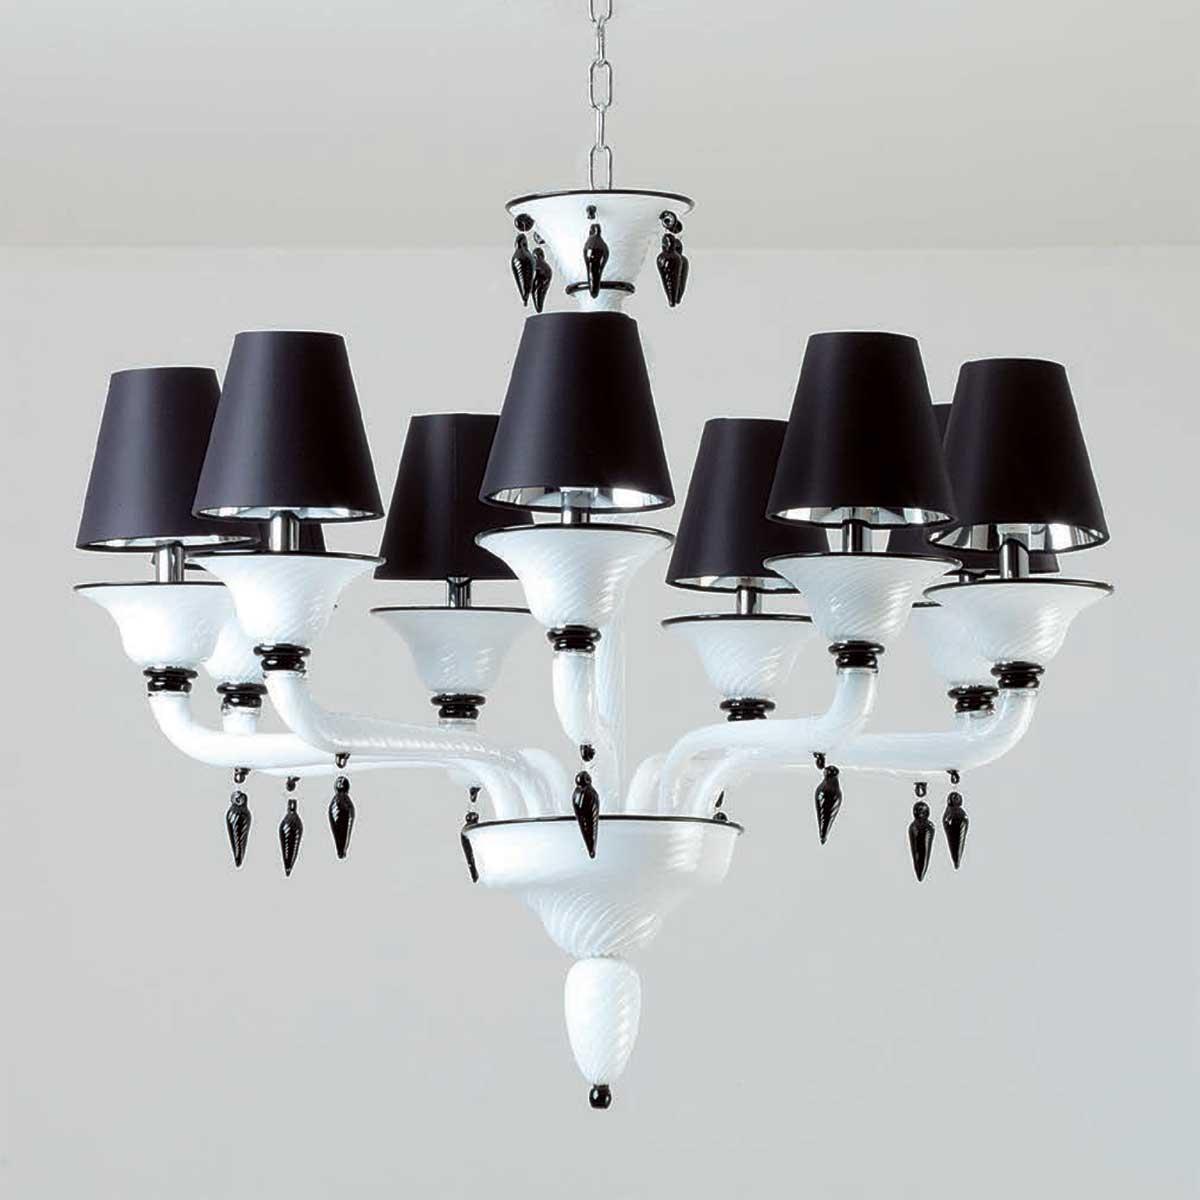 """Ofelia"" Murano glass chandelier - 9 lights - white and black"